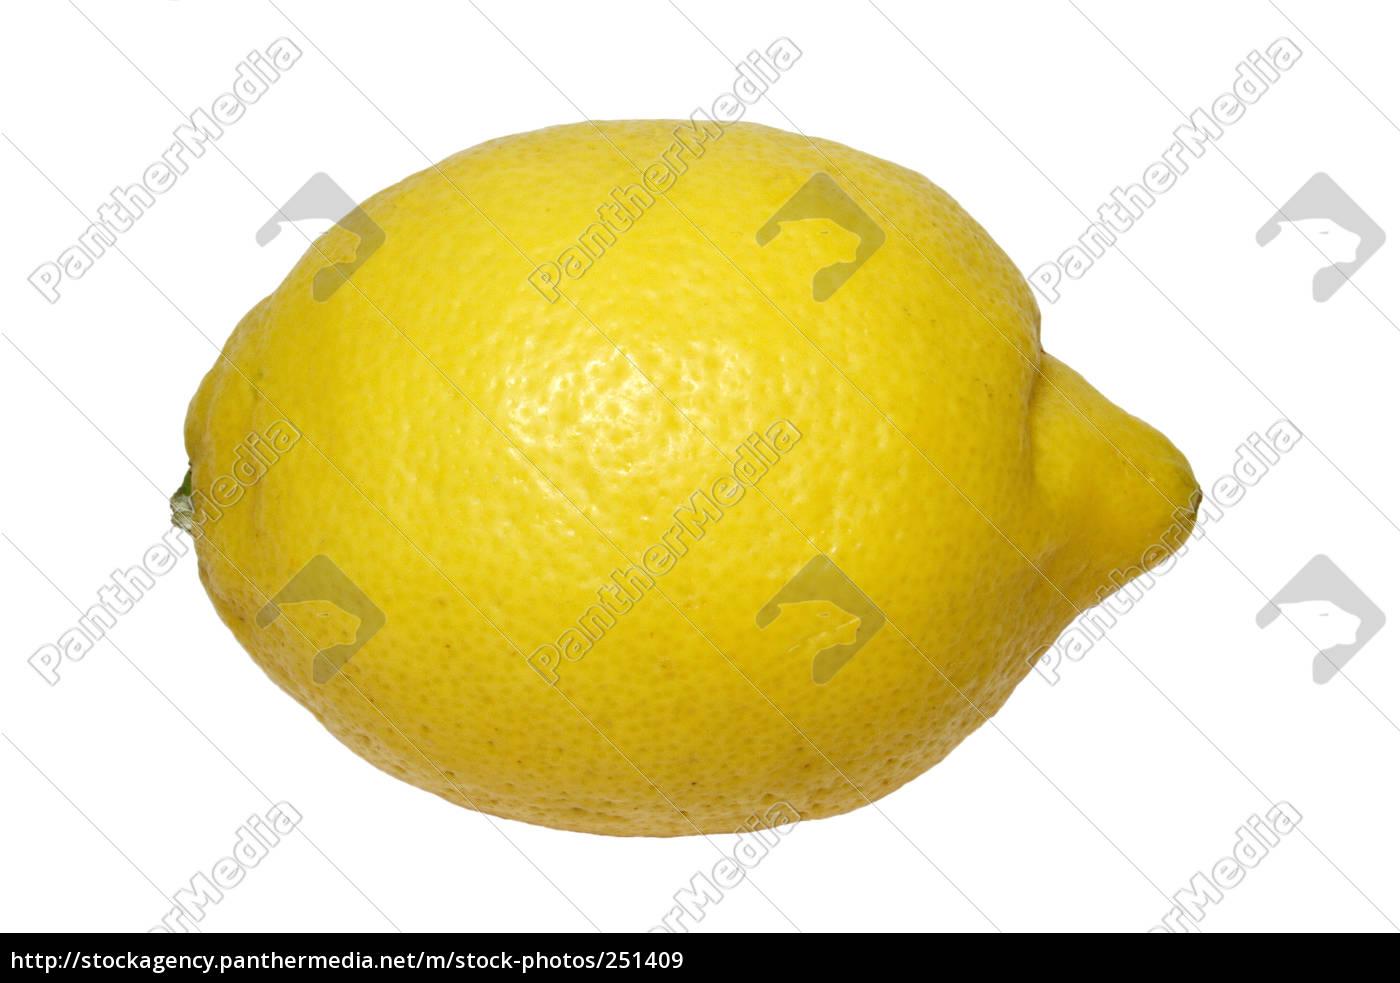 lemon - 251409